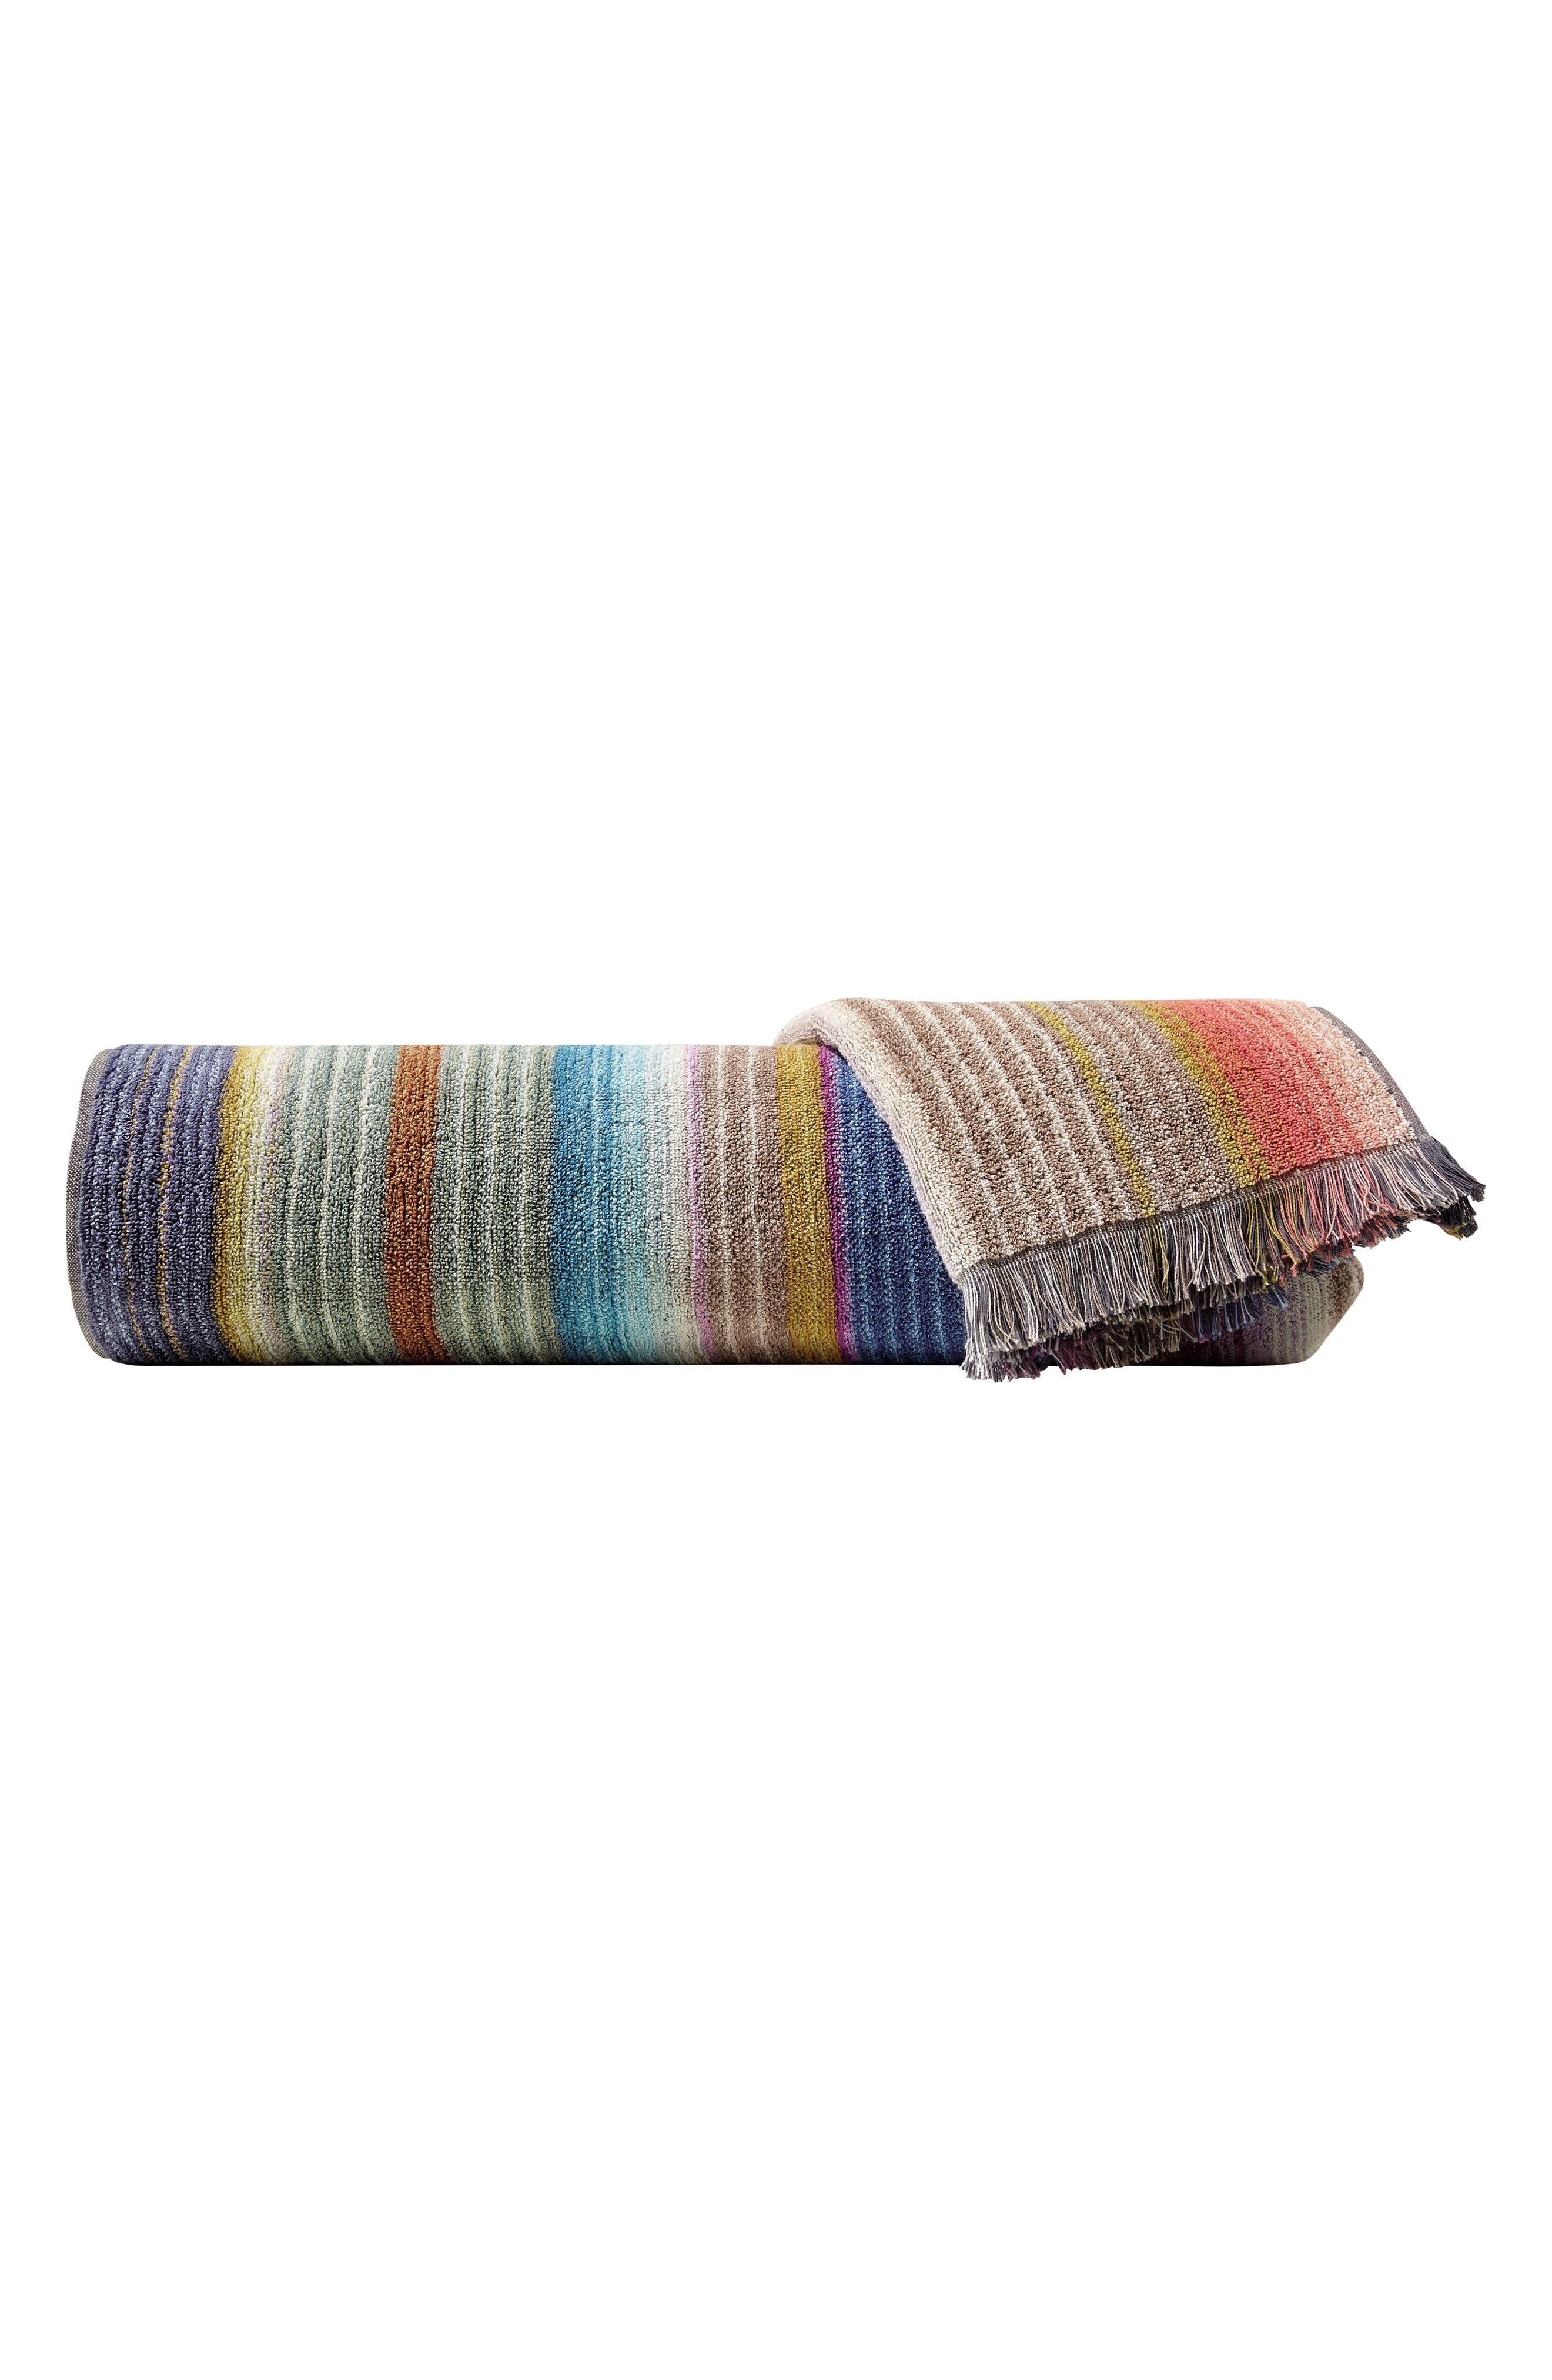 Viviette Hand Towel,                         Main,                         color, TAUPE MULTI